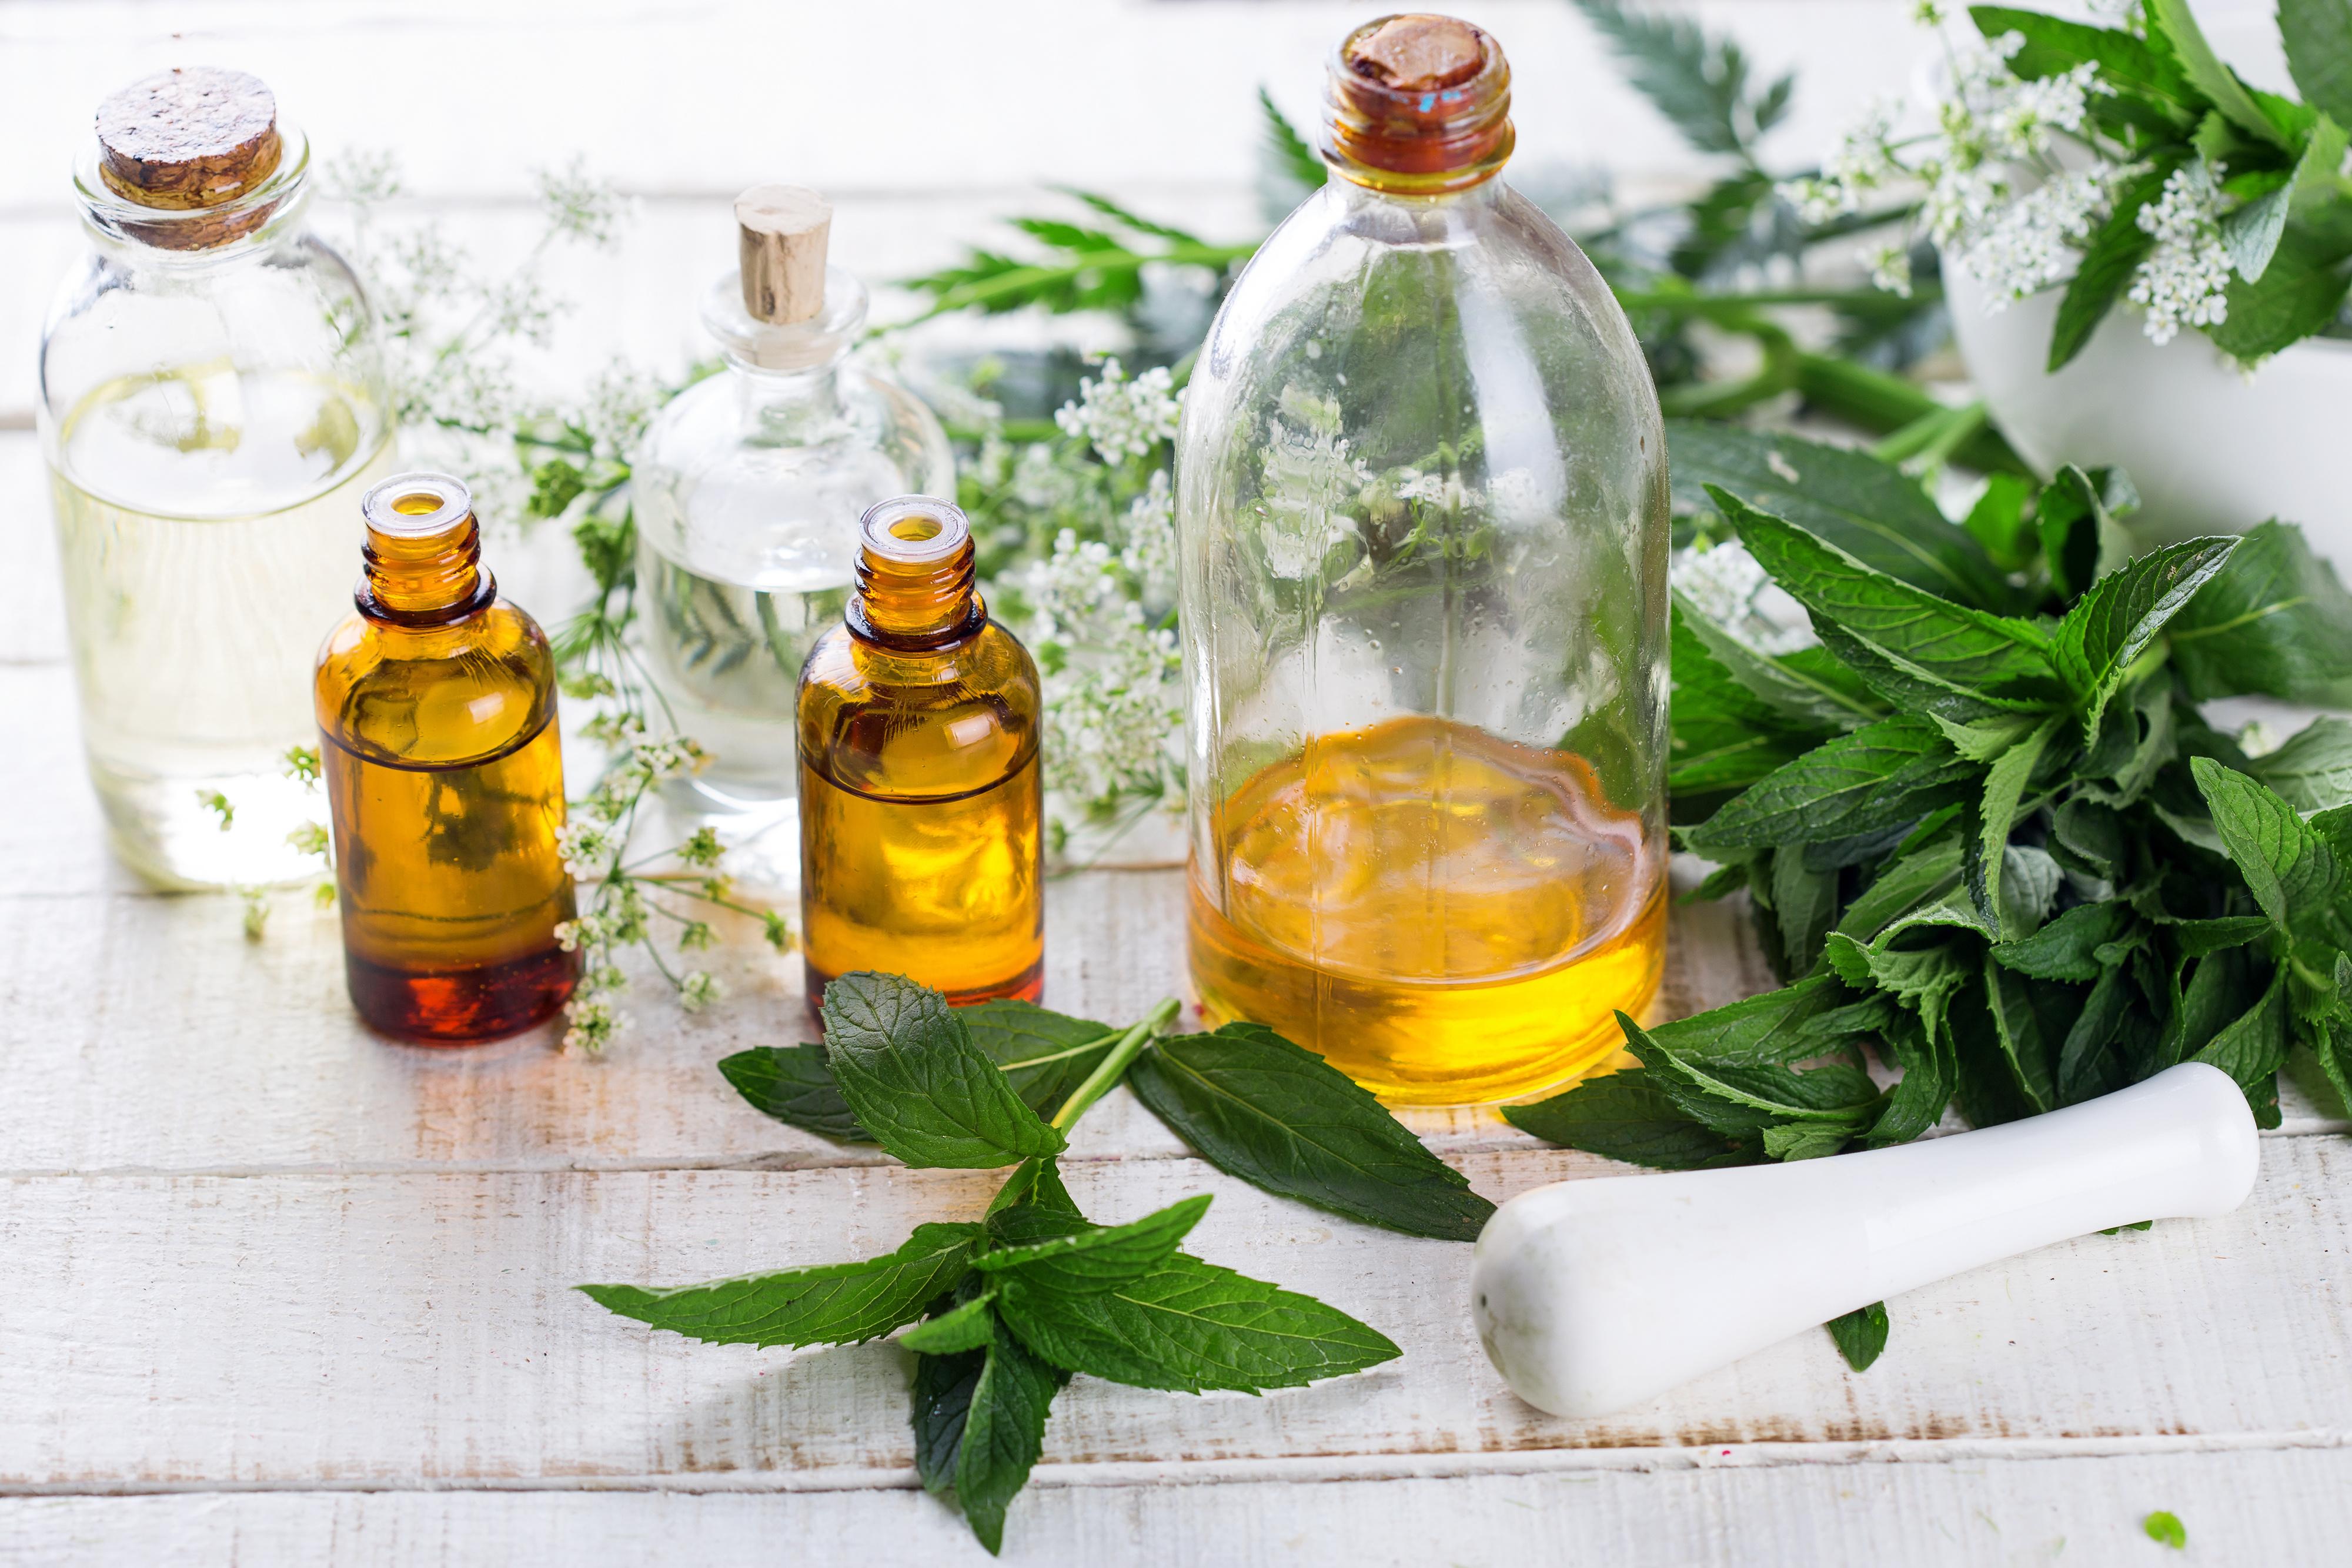 Korean skincare; Jina Lee, CEo of Urang on aromatherapy